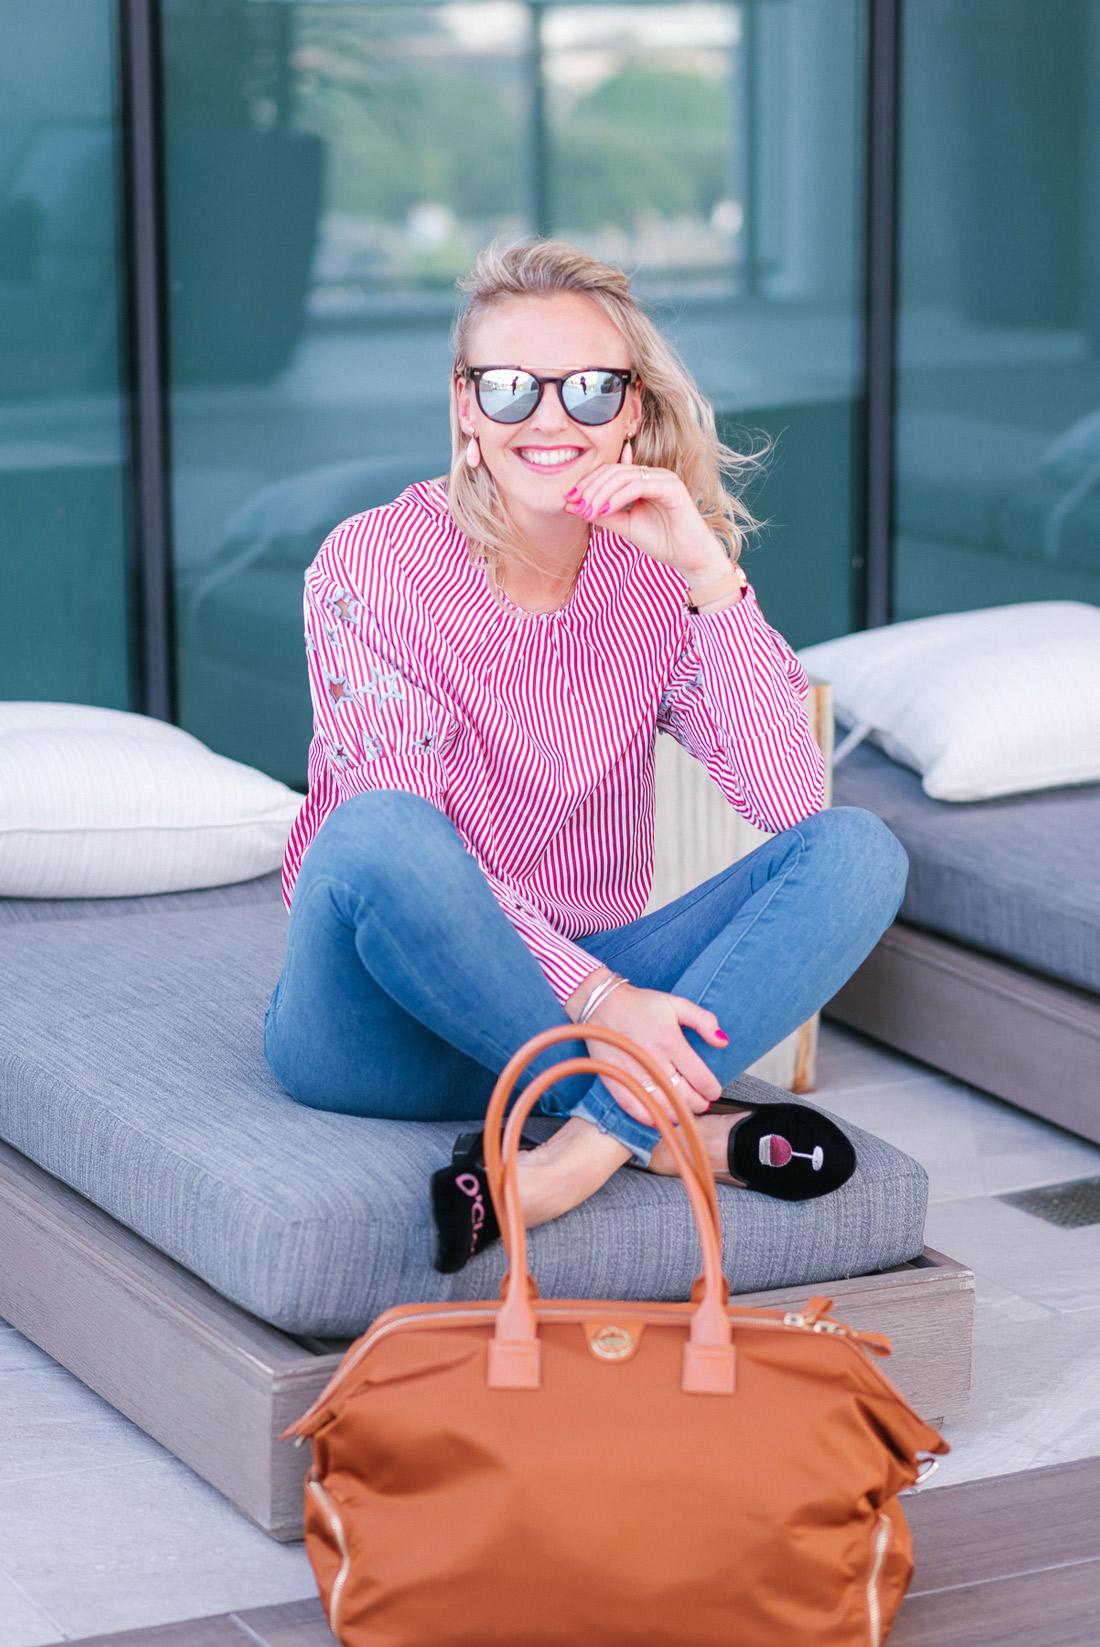 Bag-at-you---Fashion-blog---Perfect-Female-Bag